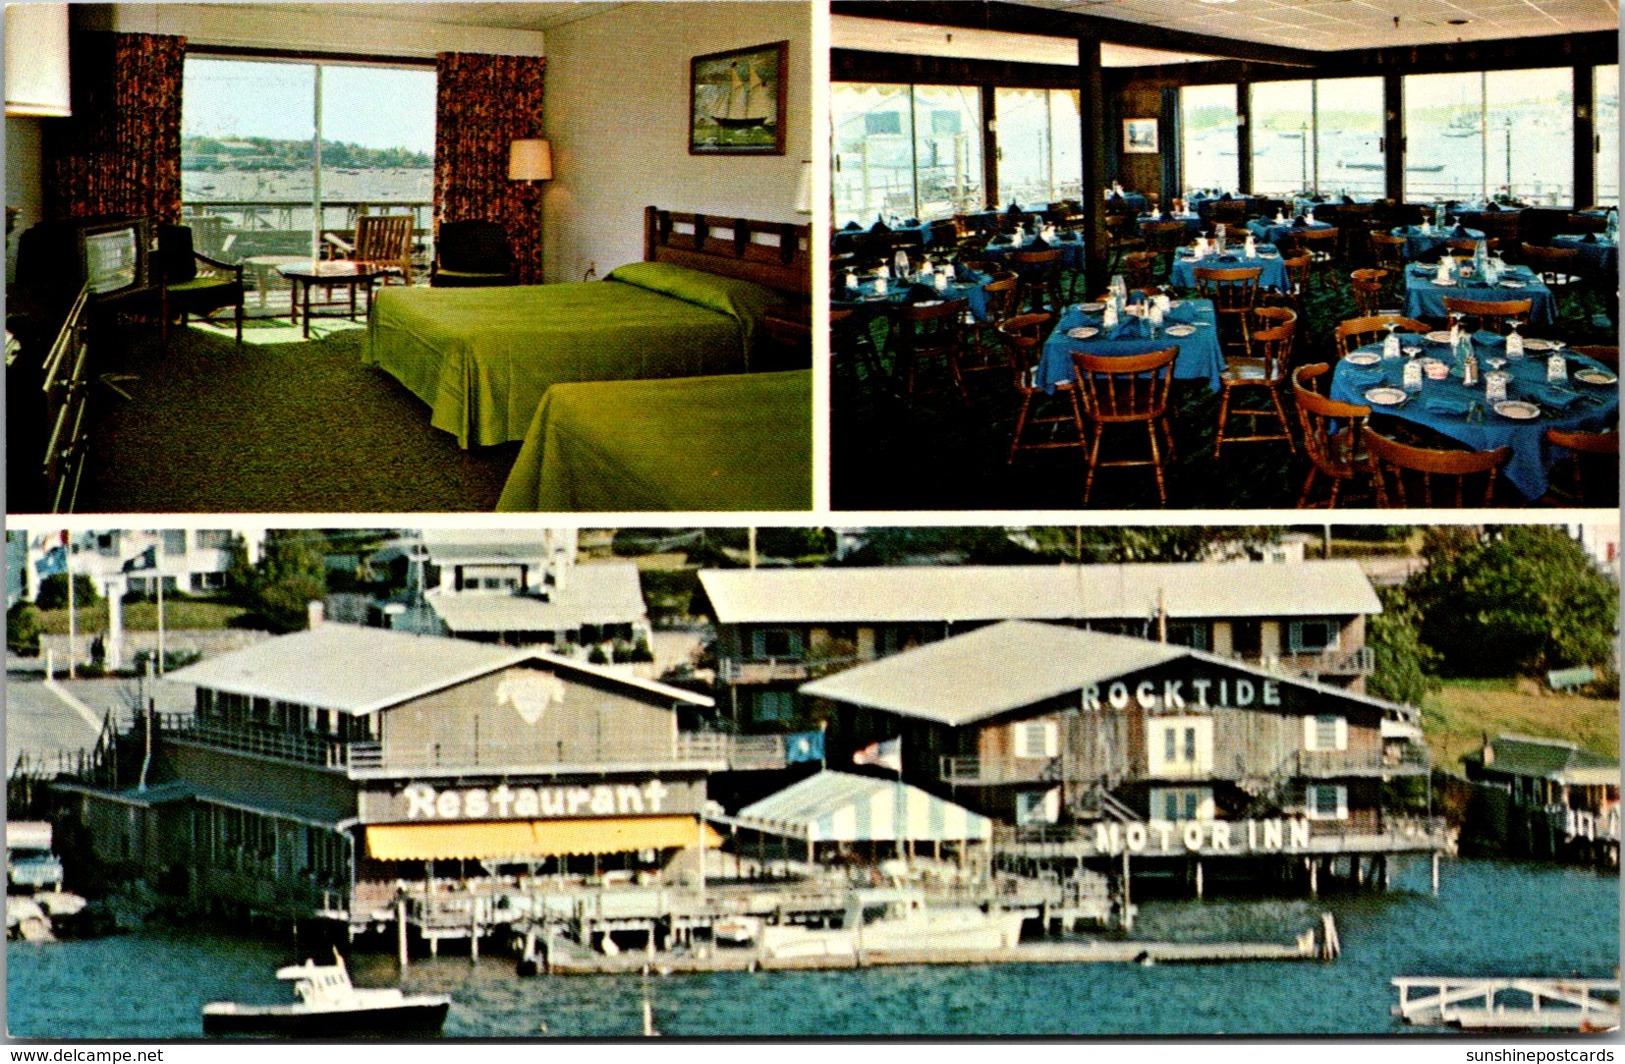 Maine Boothbay Harbor Rocktide Motor Inn and Restaurant